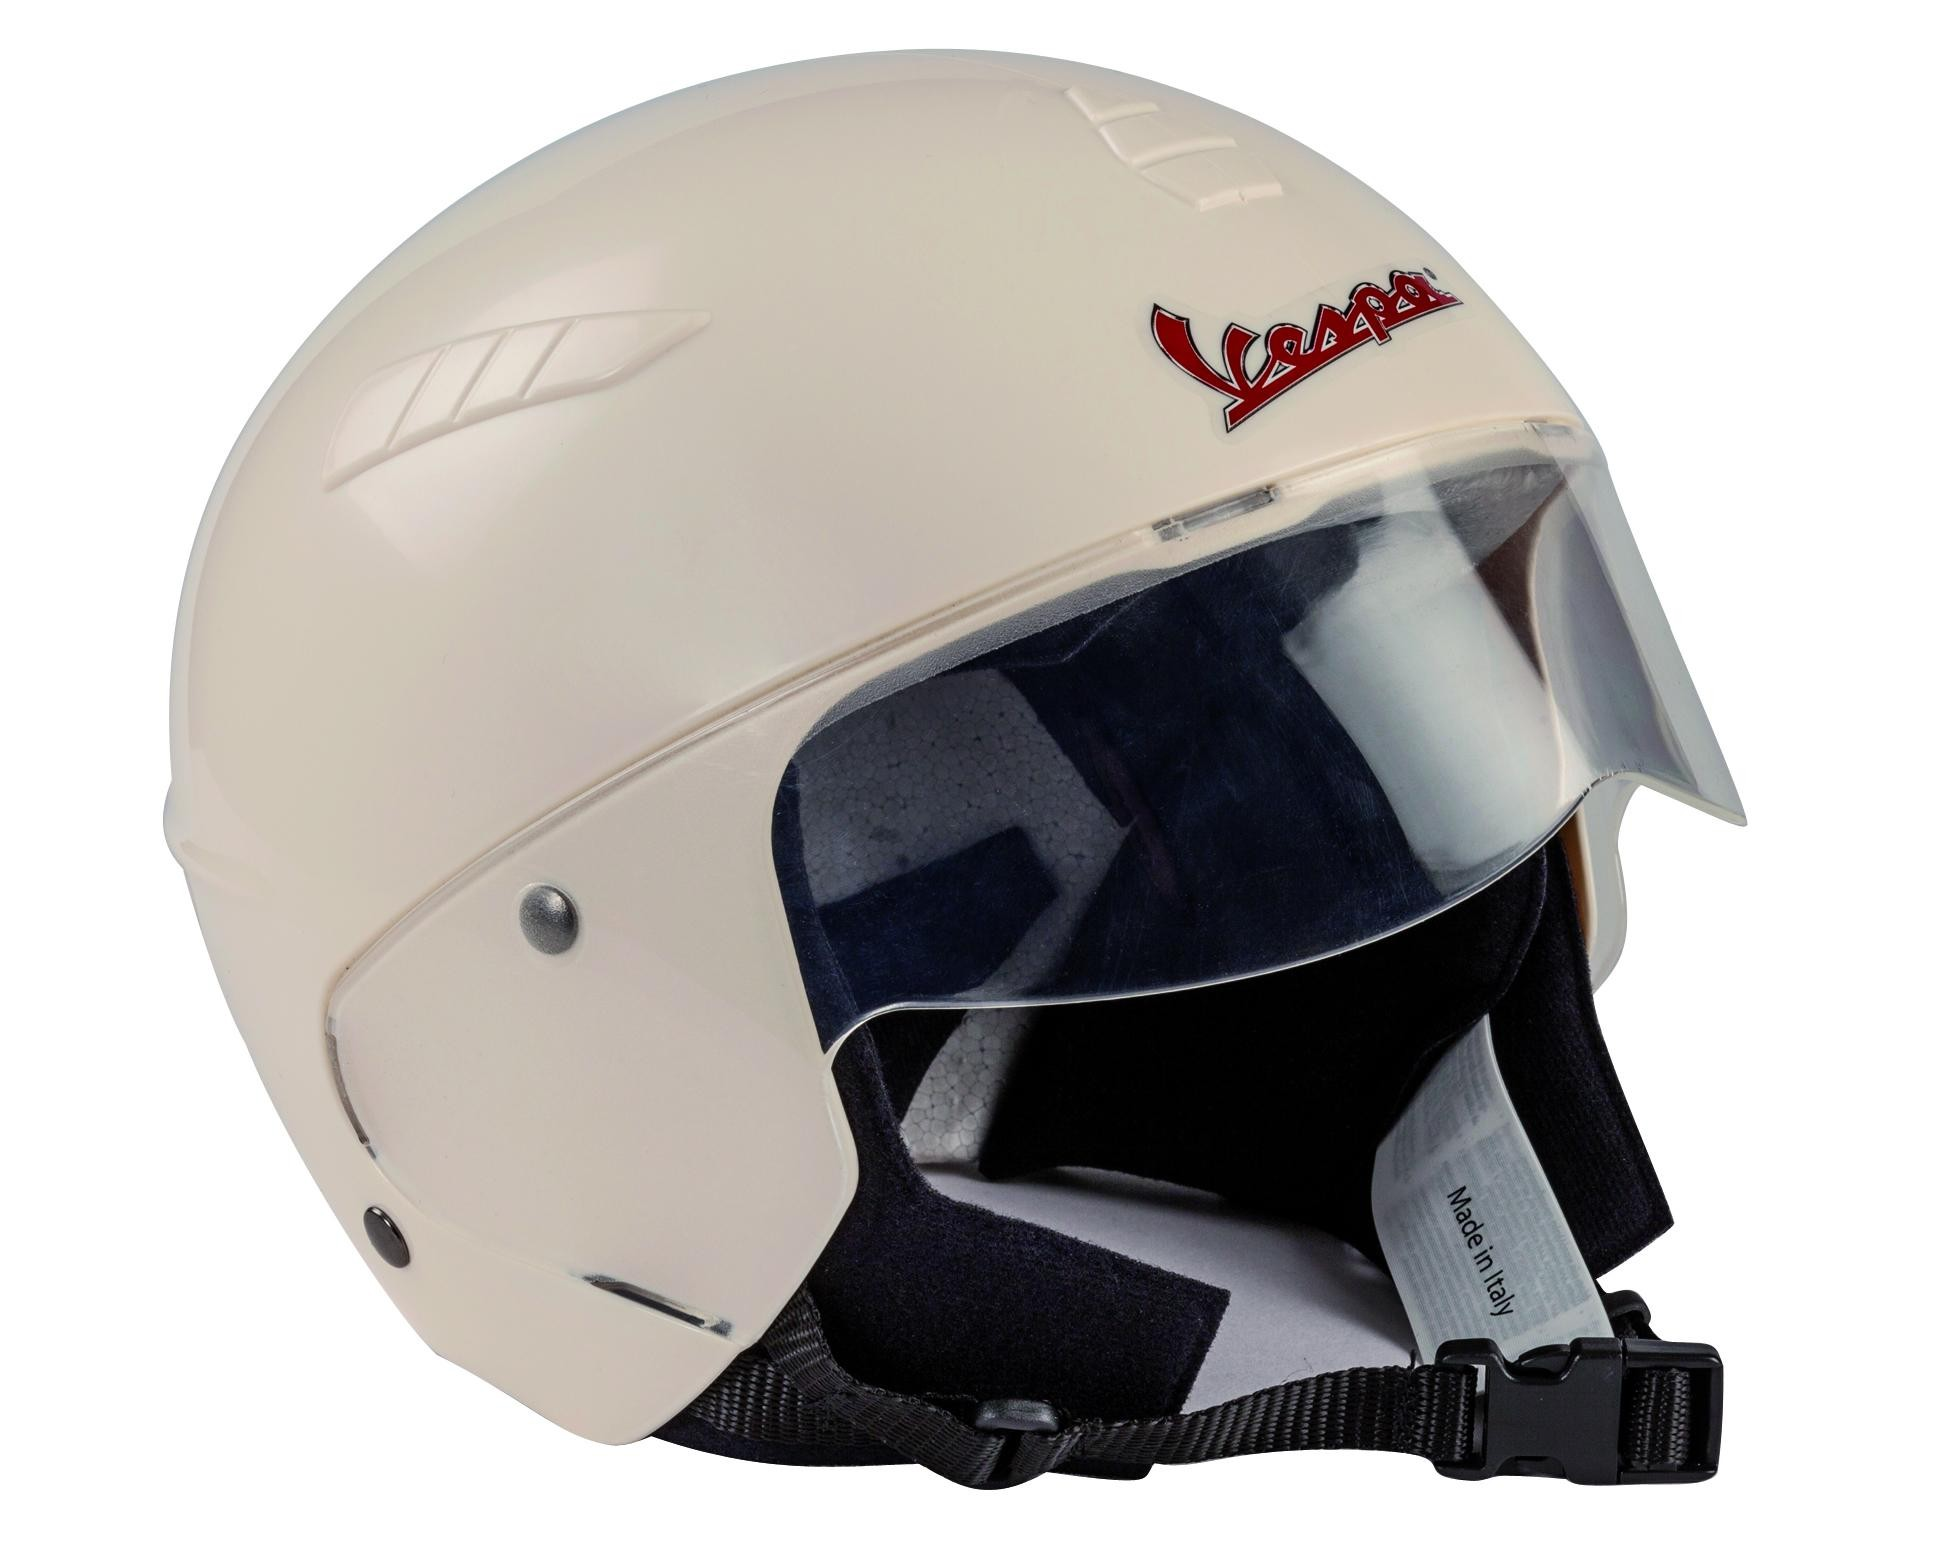 Abbildung Peg Pérego Helm Vespa